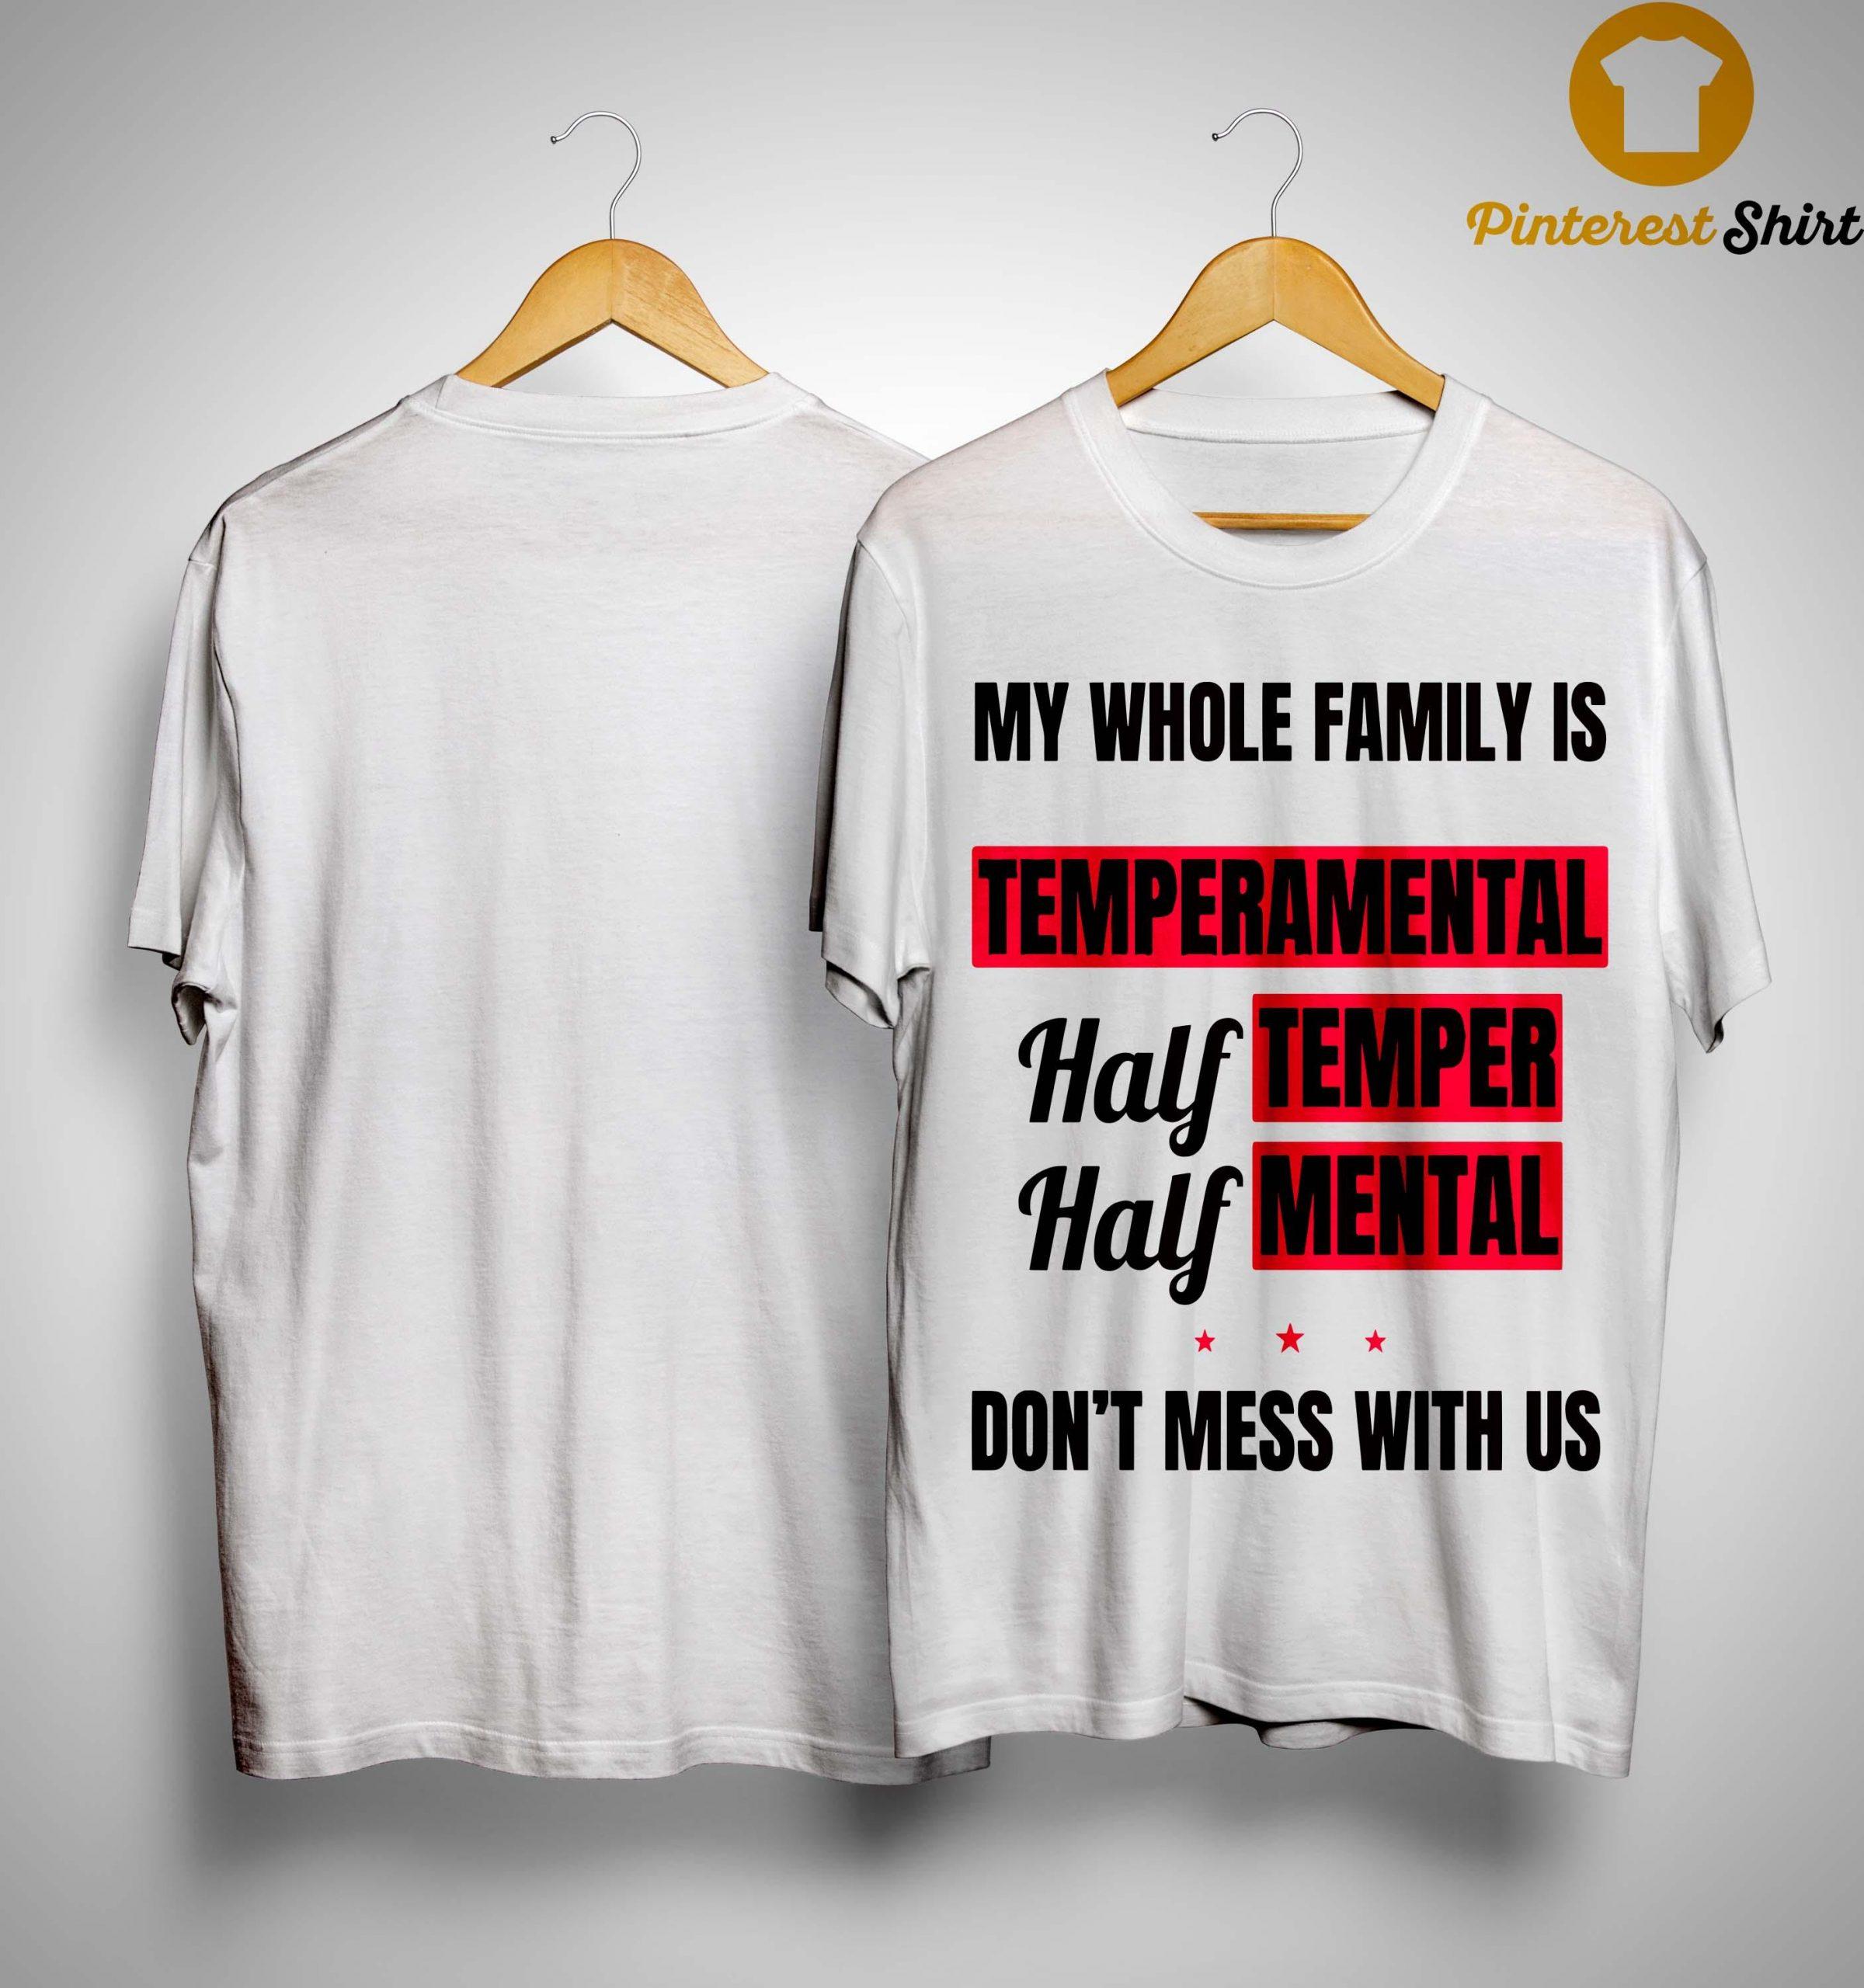 My Whole Family Is Temperamental Half Temper Half Mental Shirt